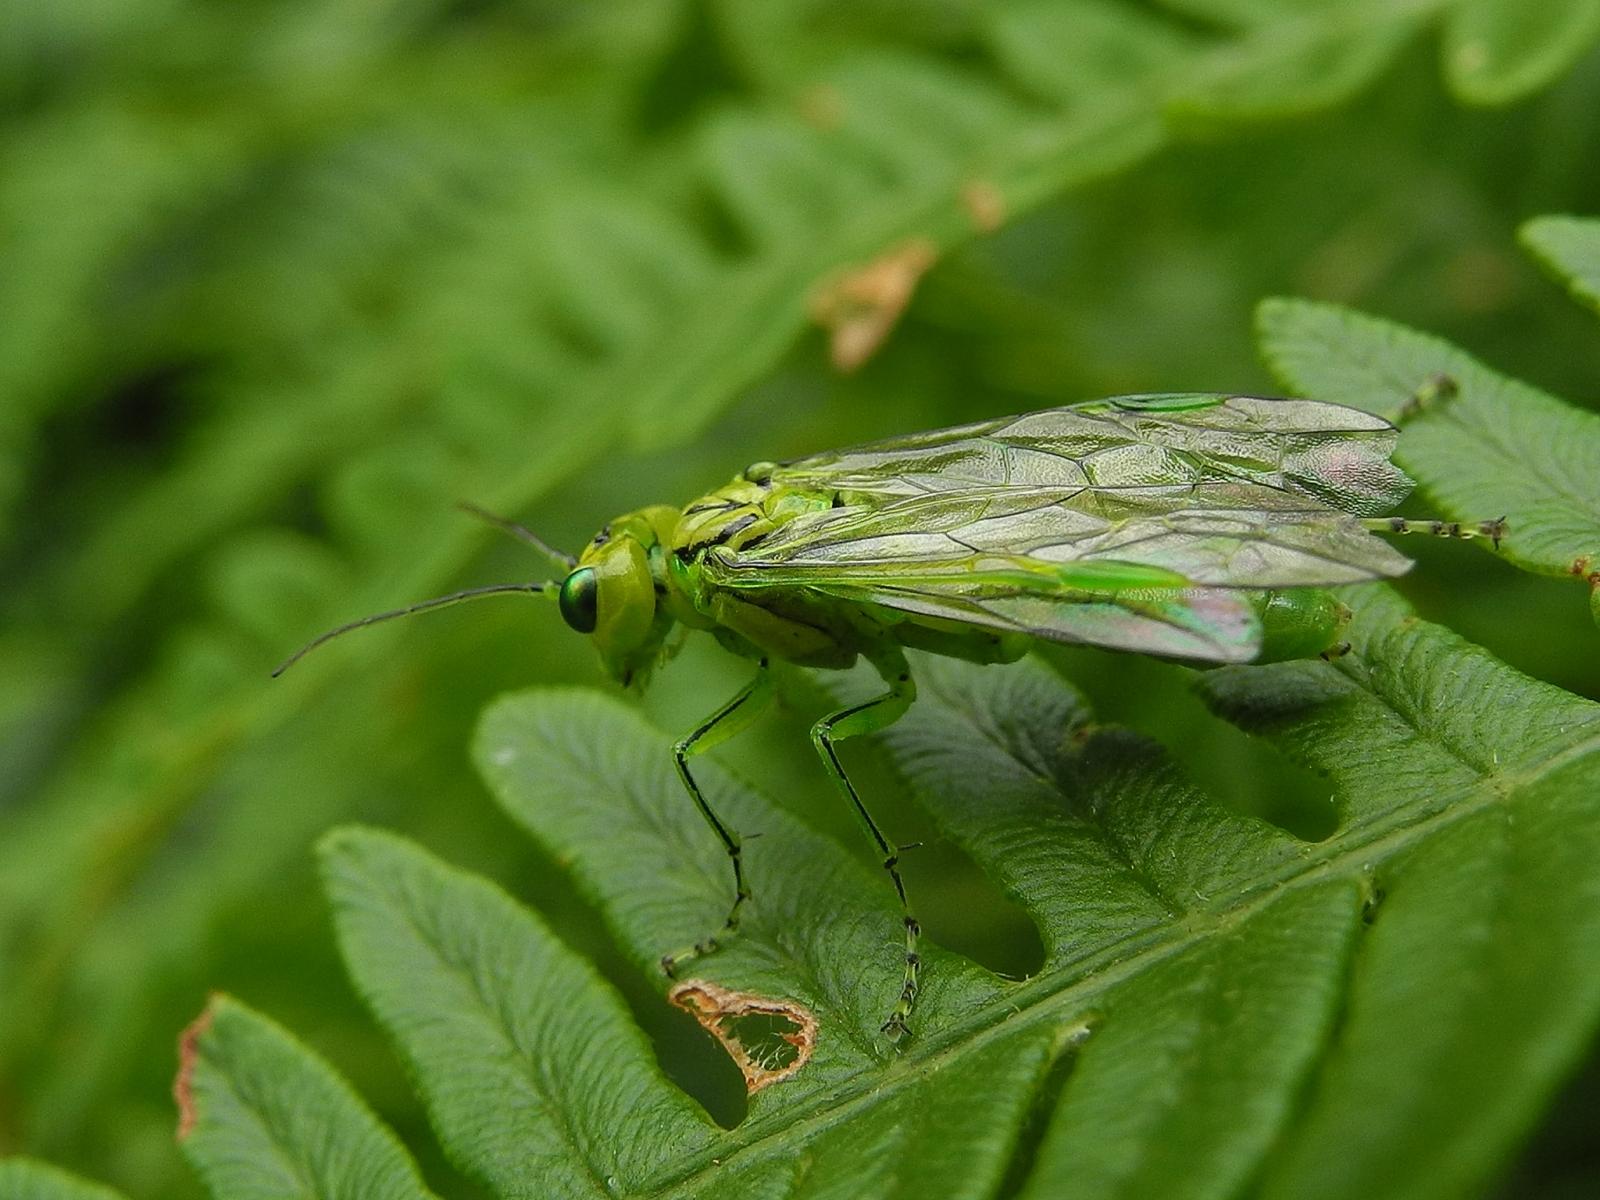 Rhogogaster viridis, Clumber Park